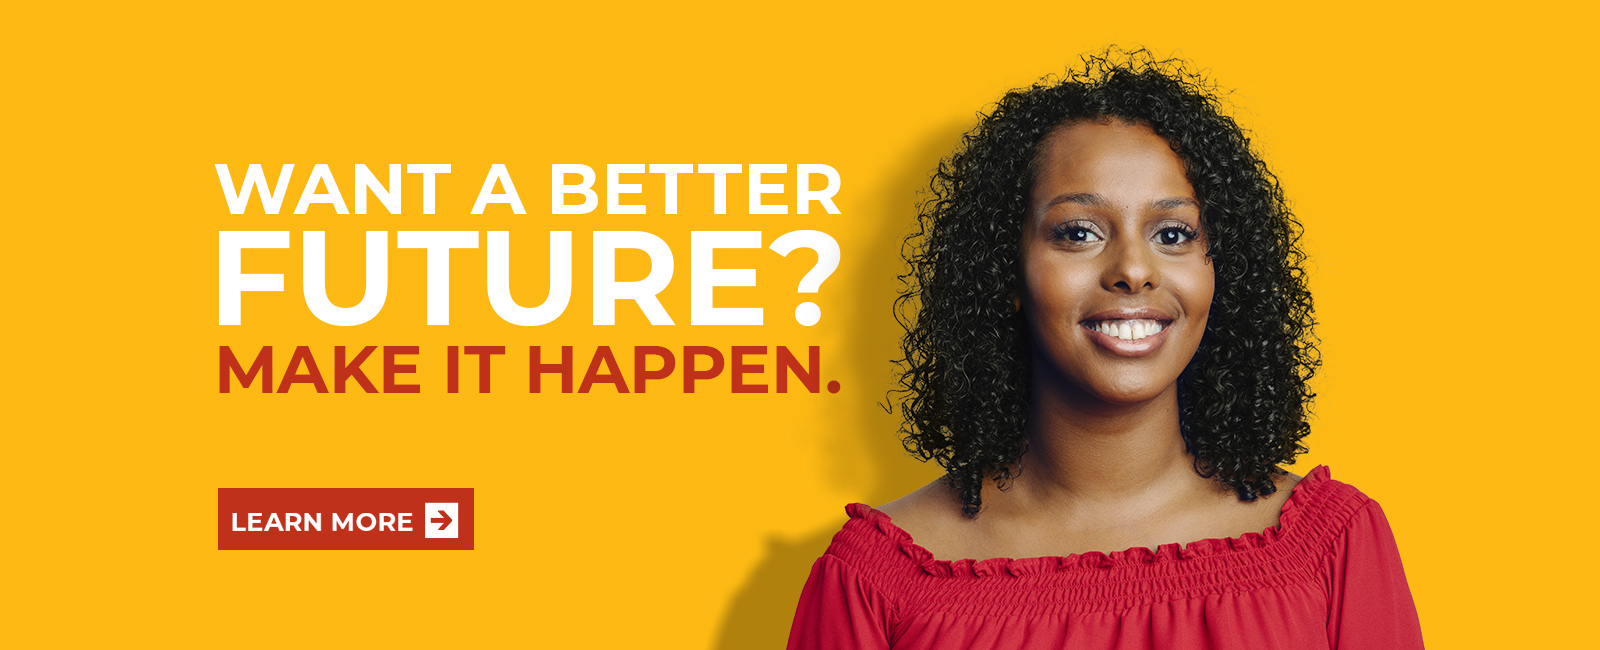 Want a better future? Make it happen.